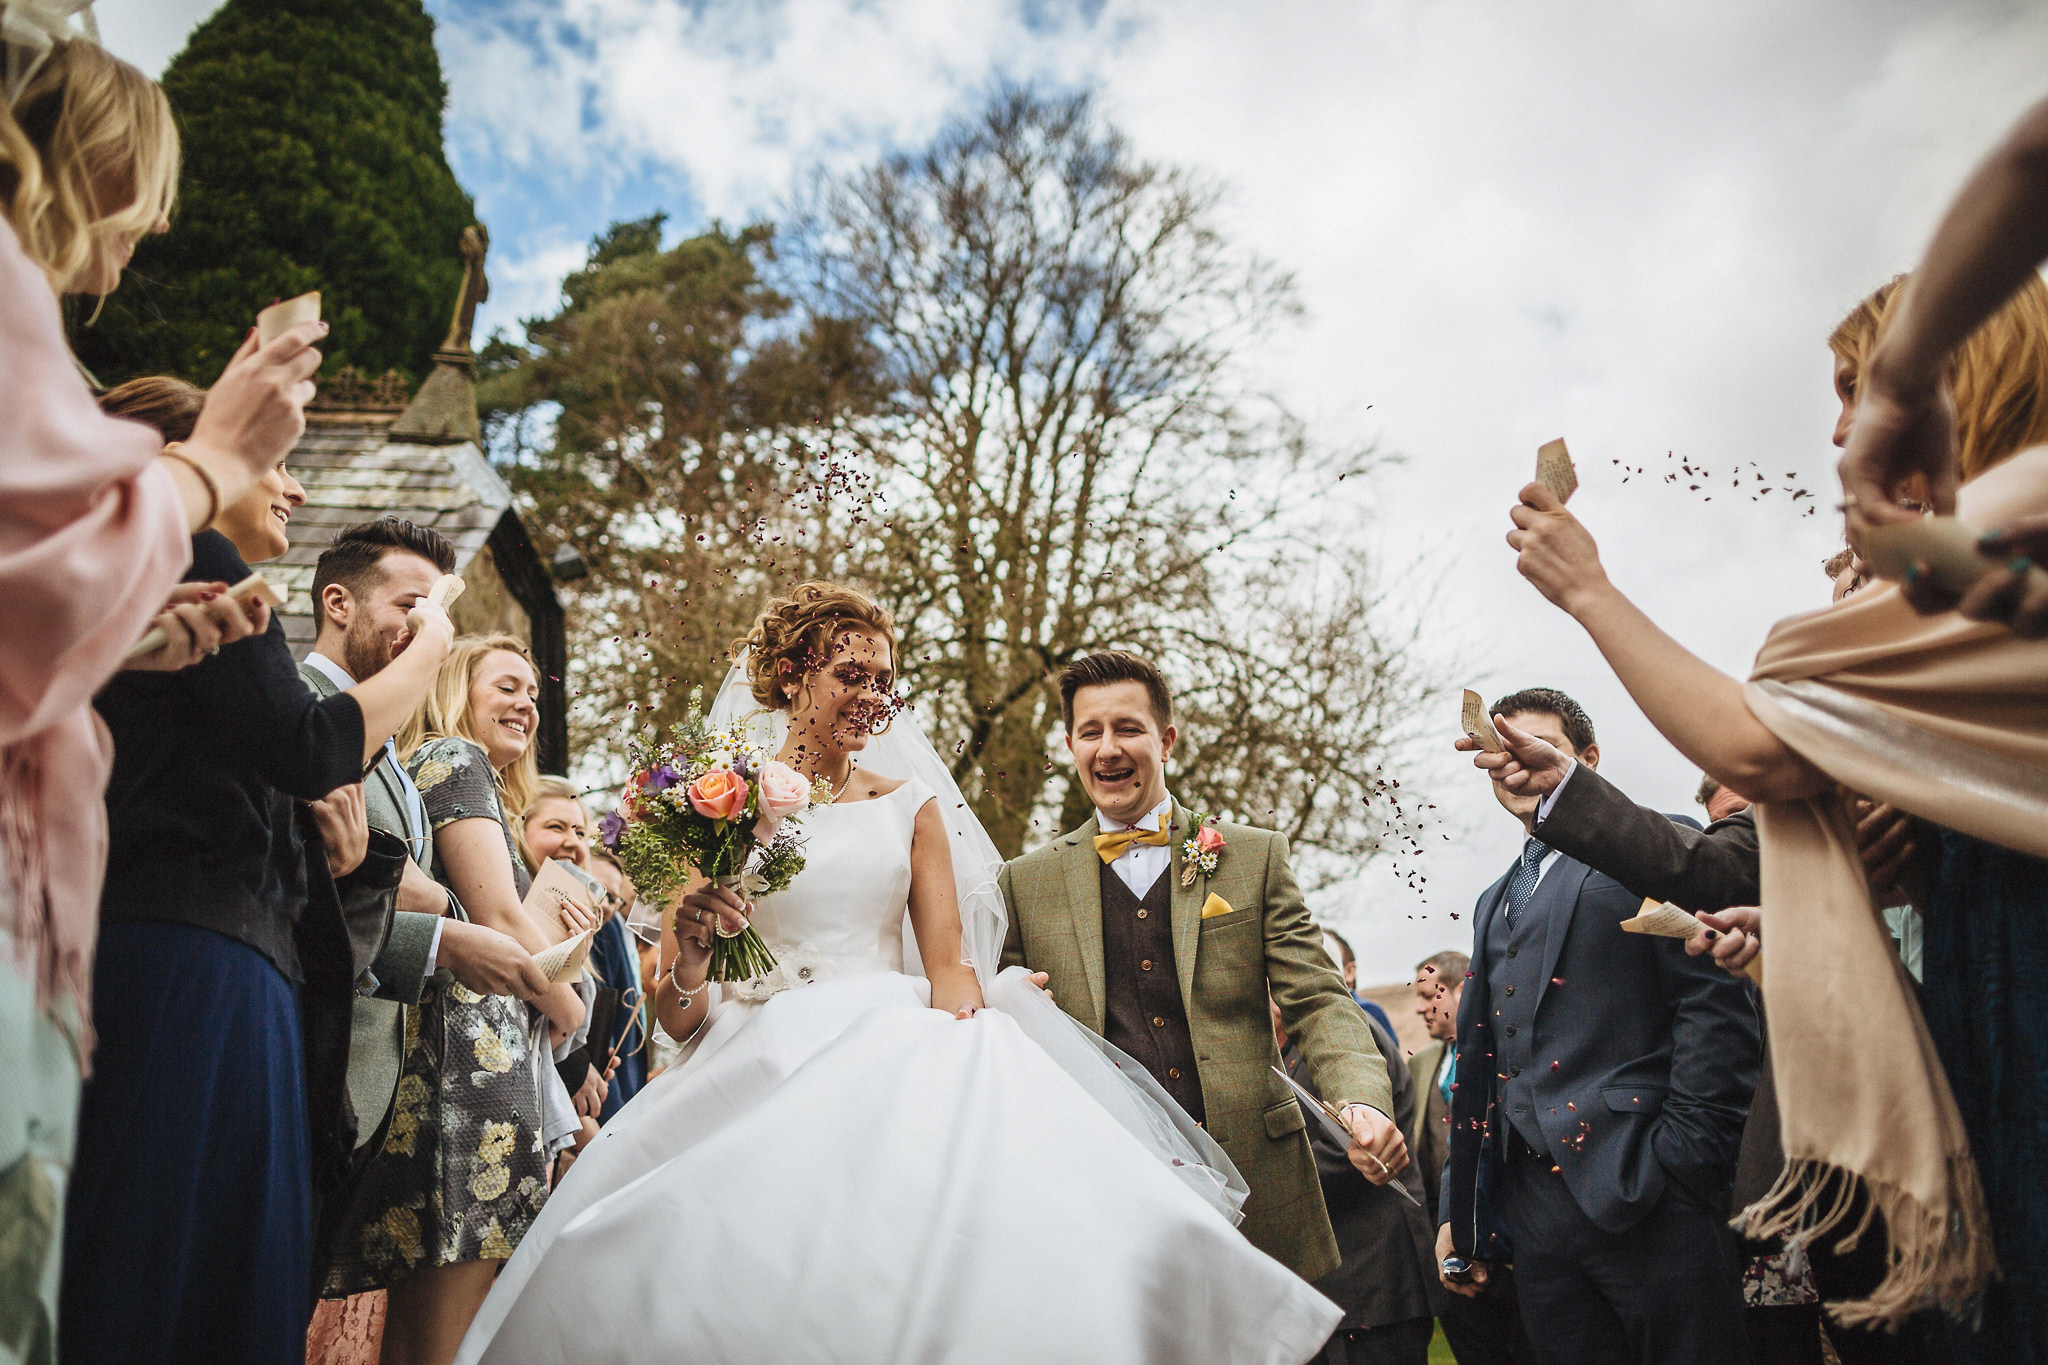 Lancashire-Creative-natural-documentary-wedding-photography-90051